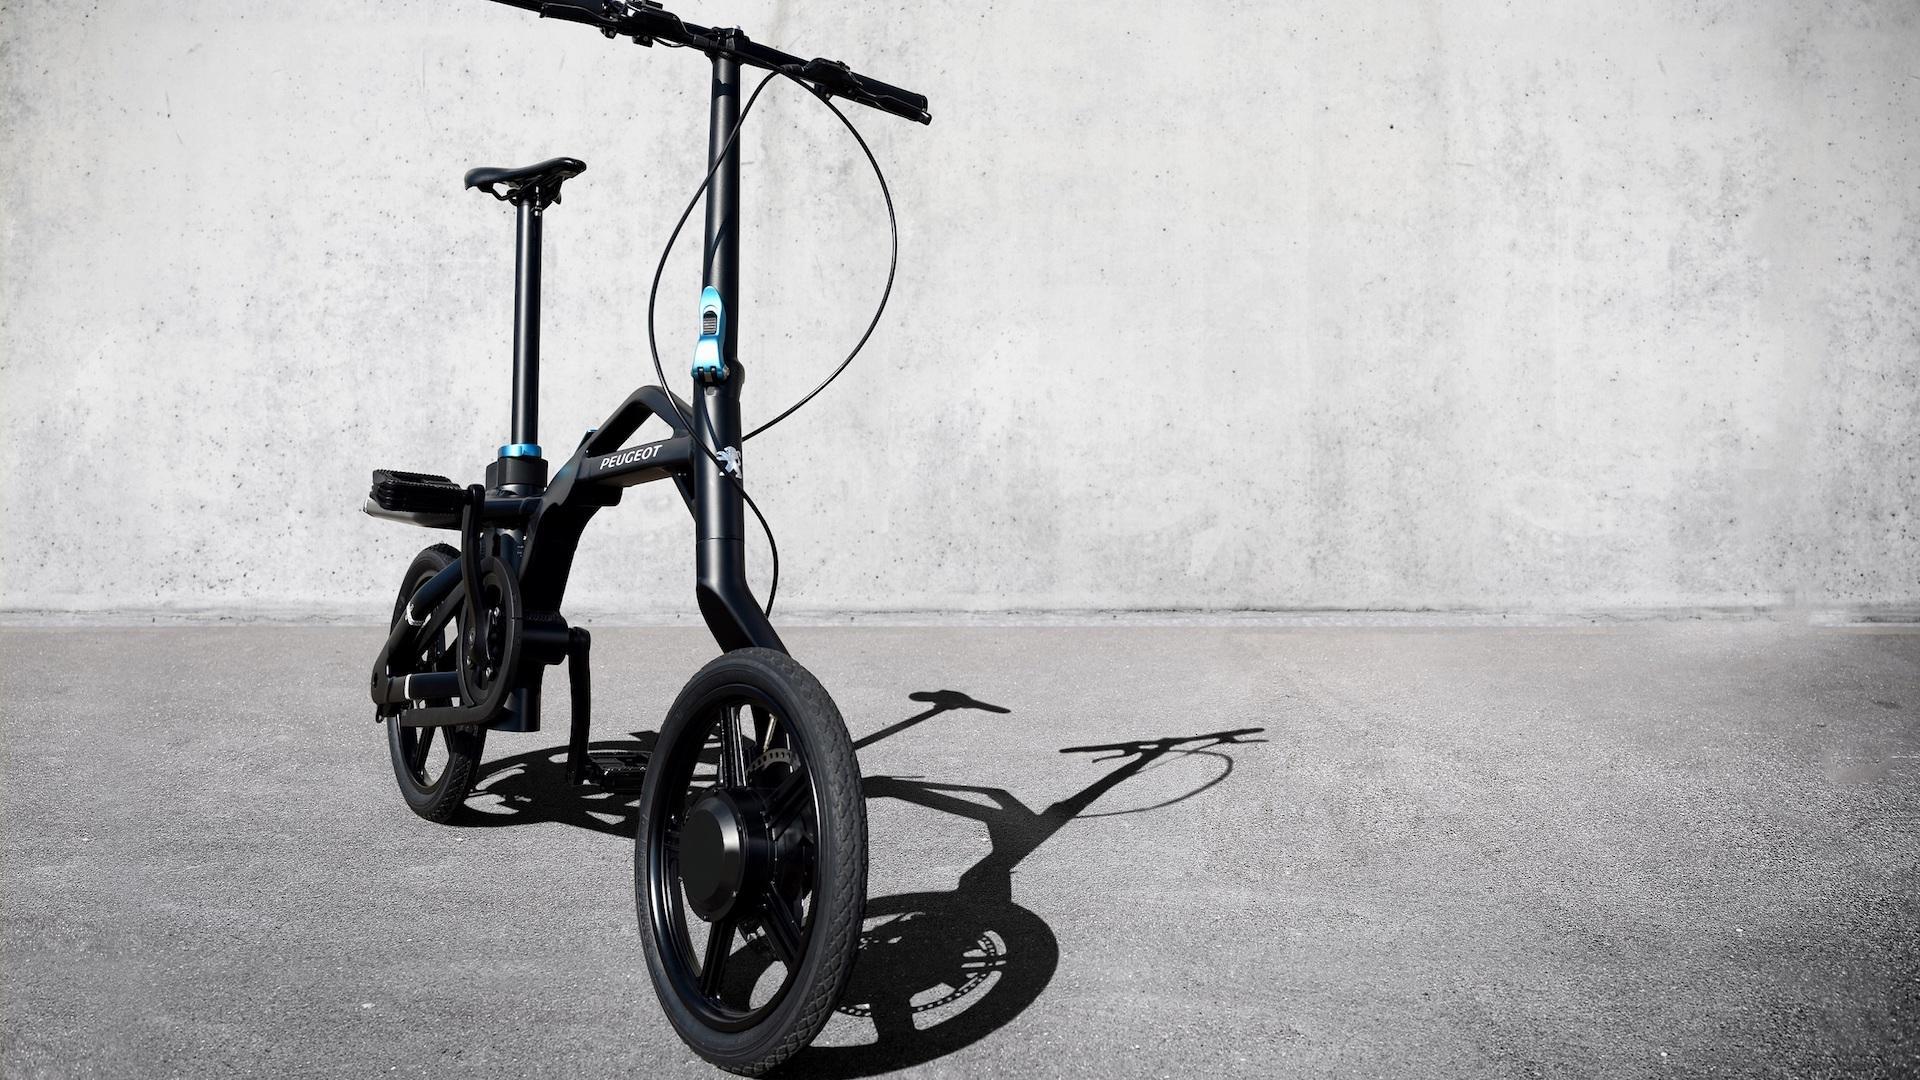 peugeot-bicicleta-09092016-in2